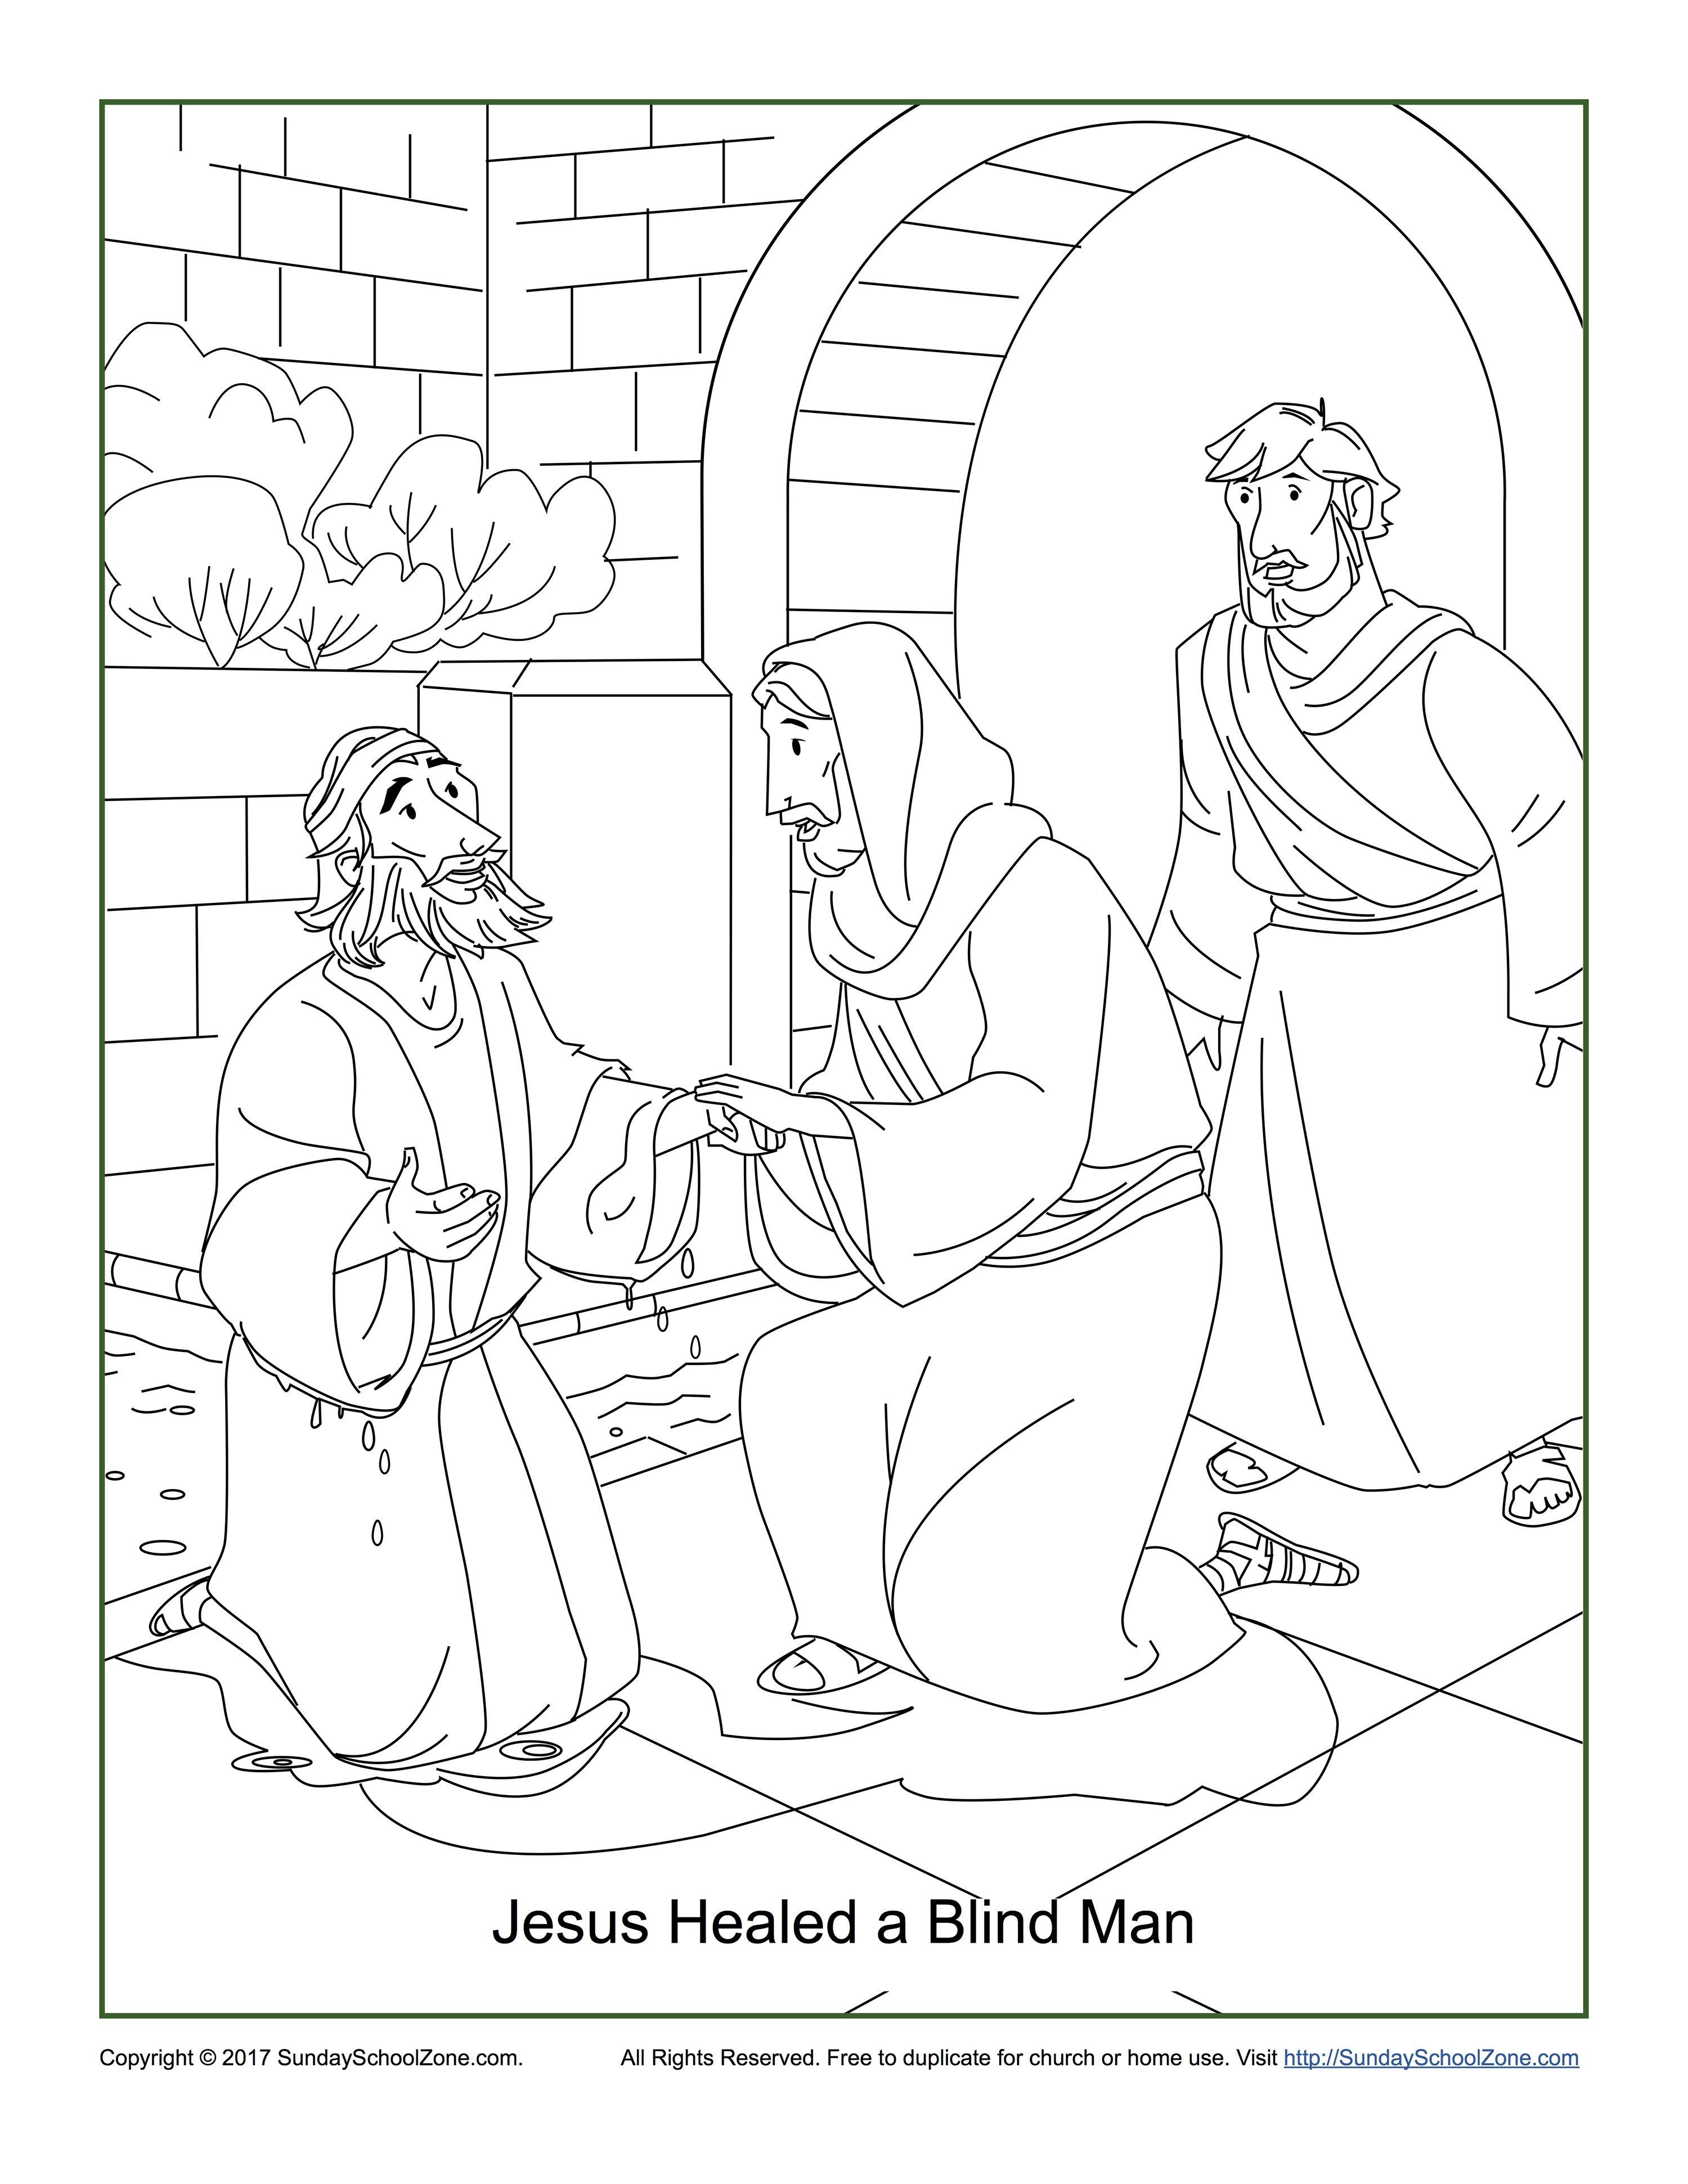 Jesus Healed A Blind Man Coloring Page John 9:1-7 | Jesus